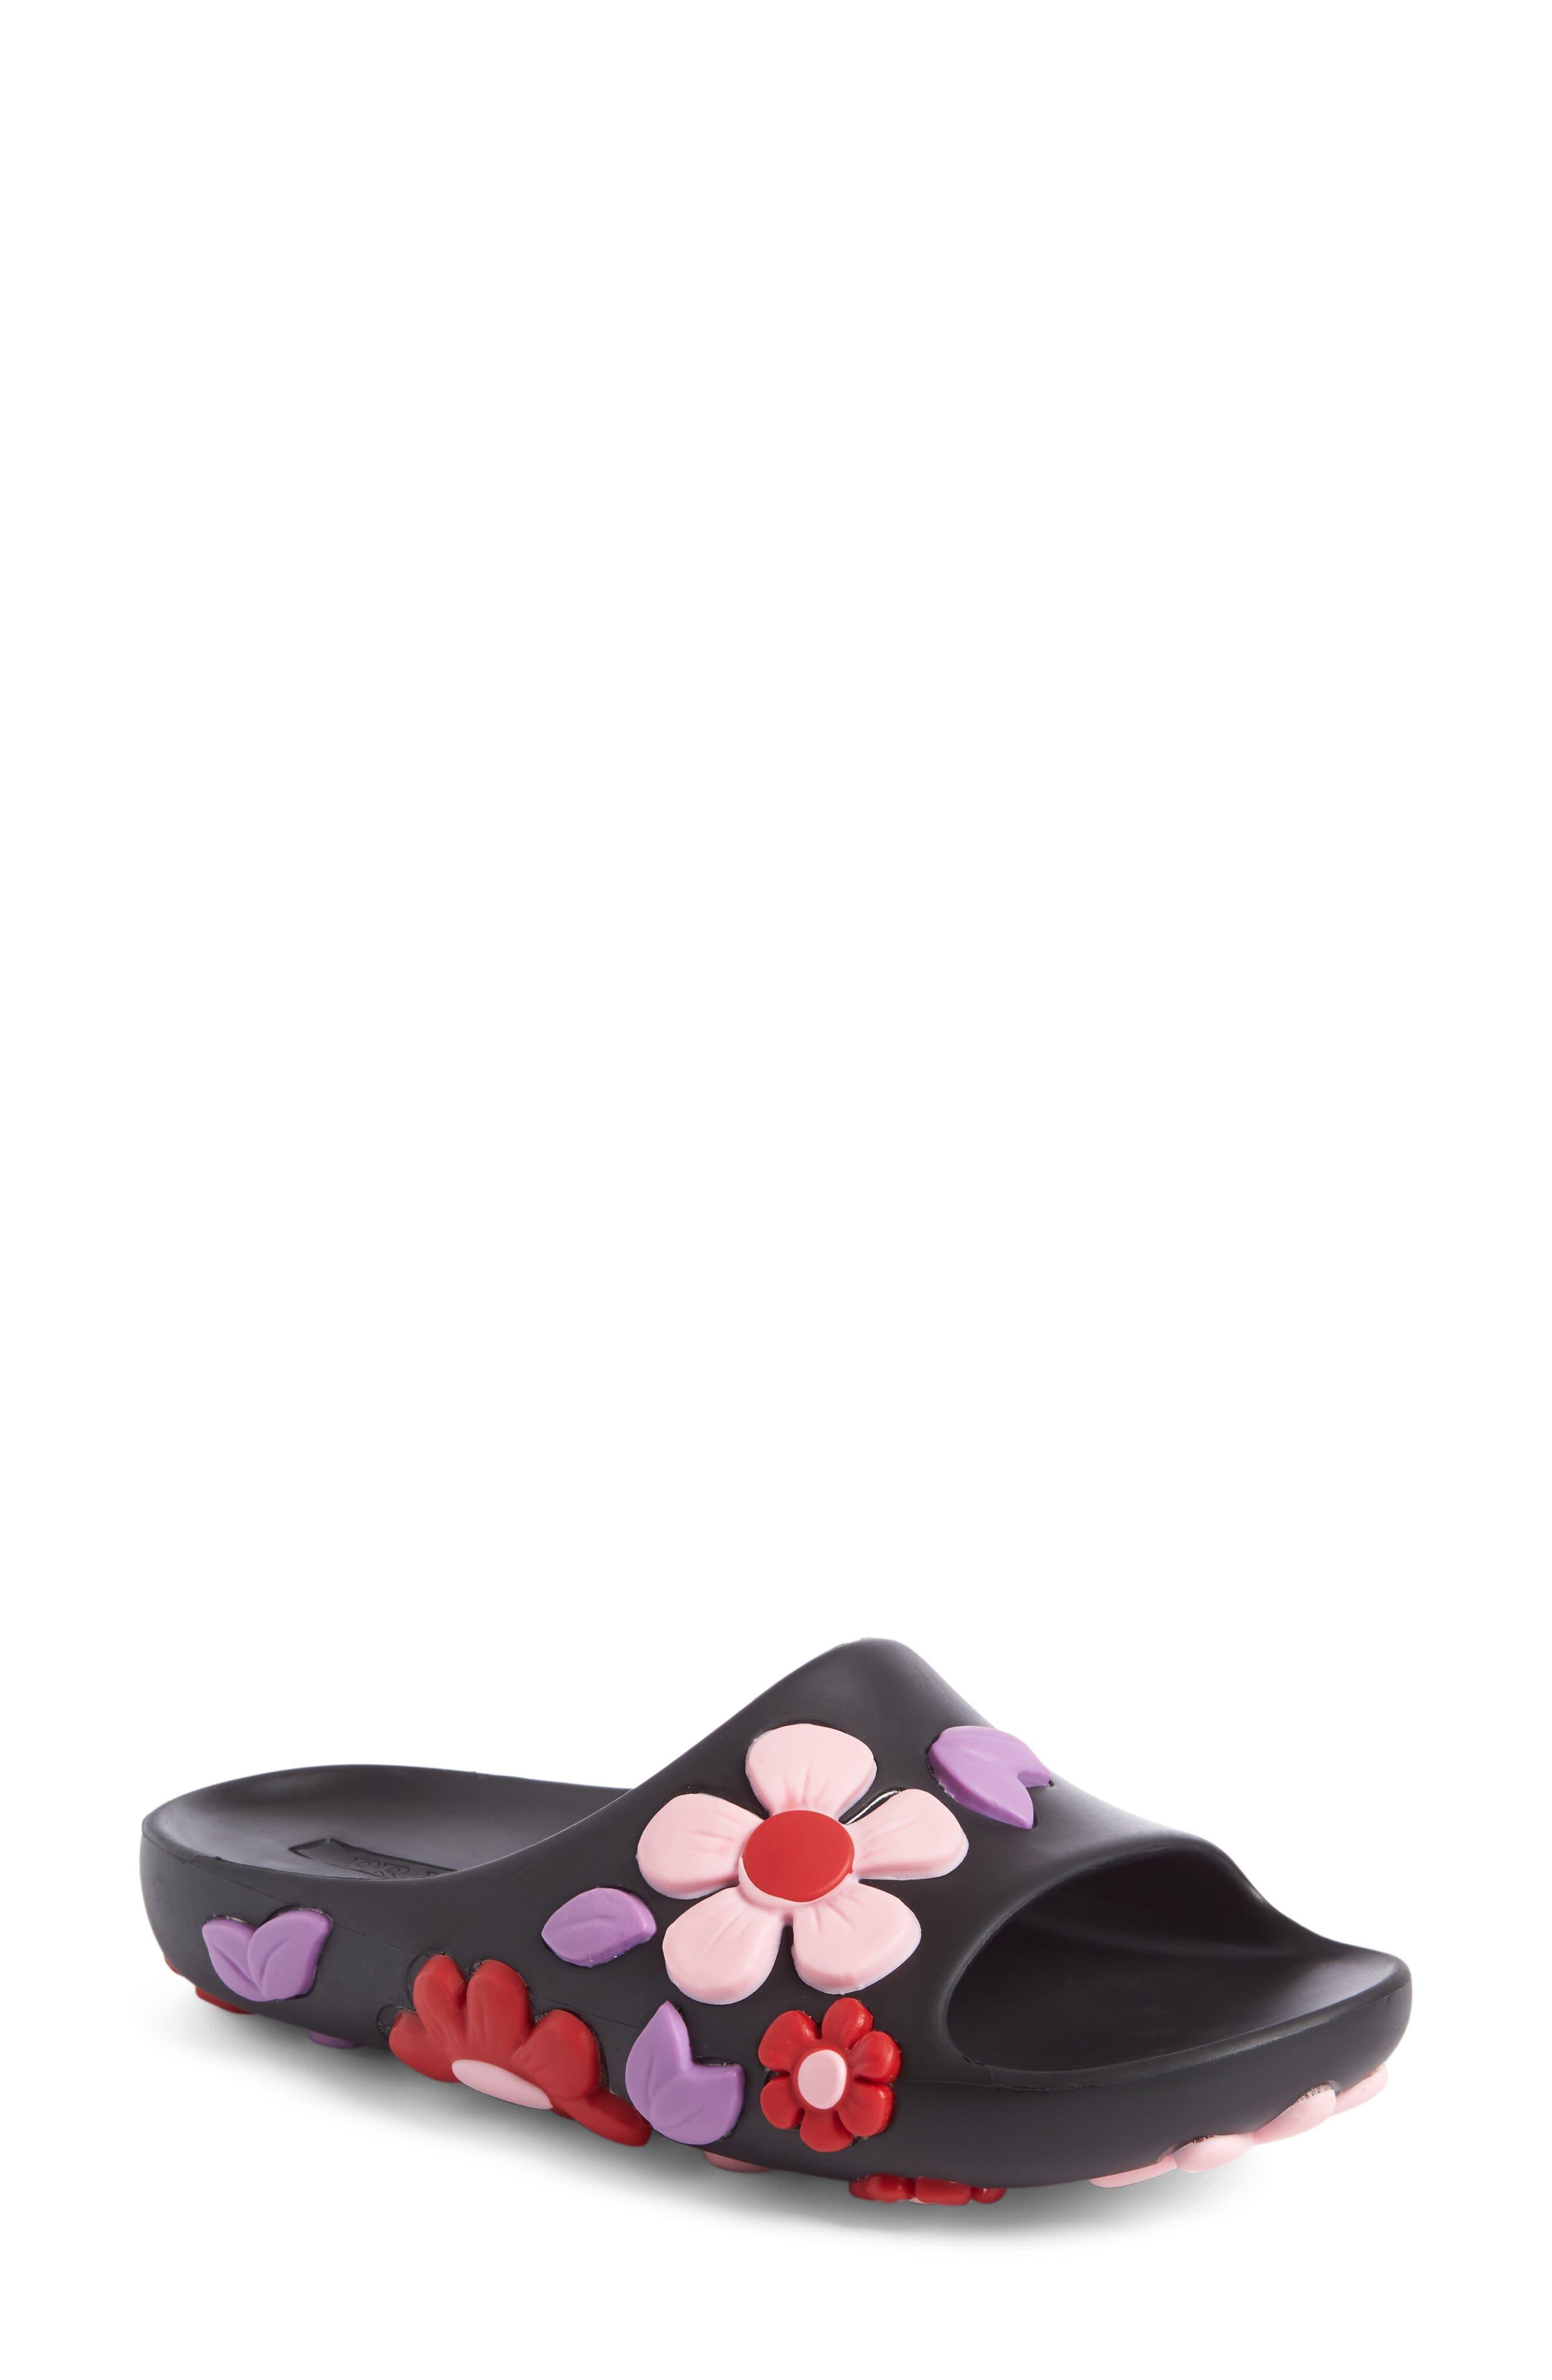 Floral Slide Sandal,                             Main thumbnail 1, color,                             001